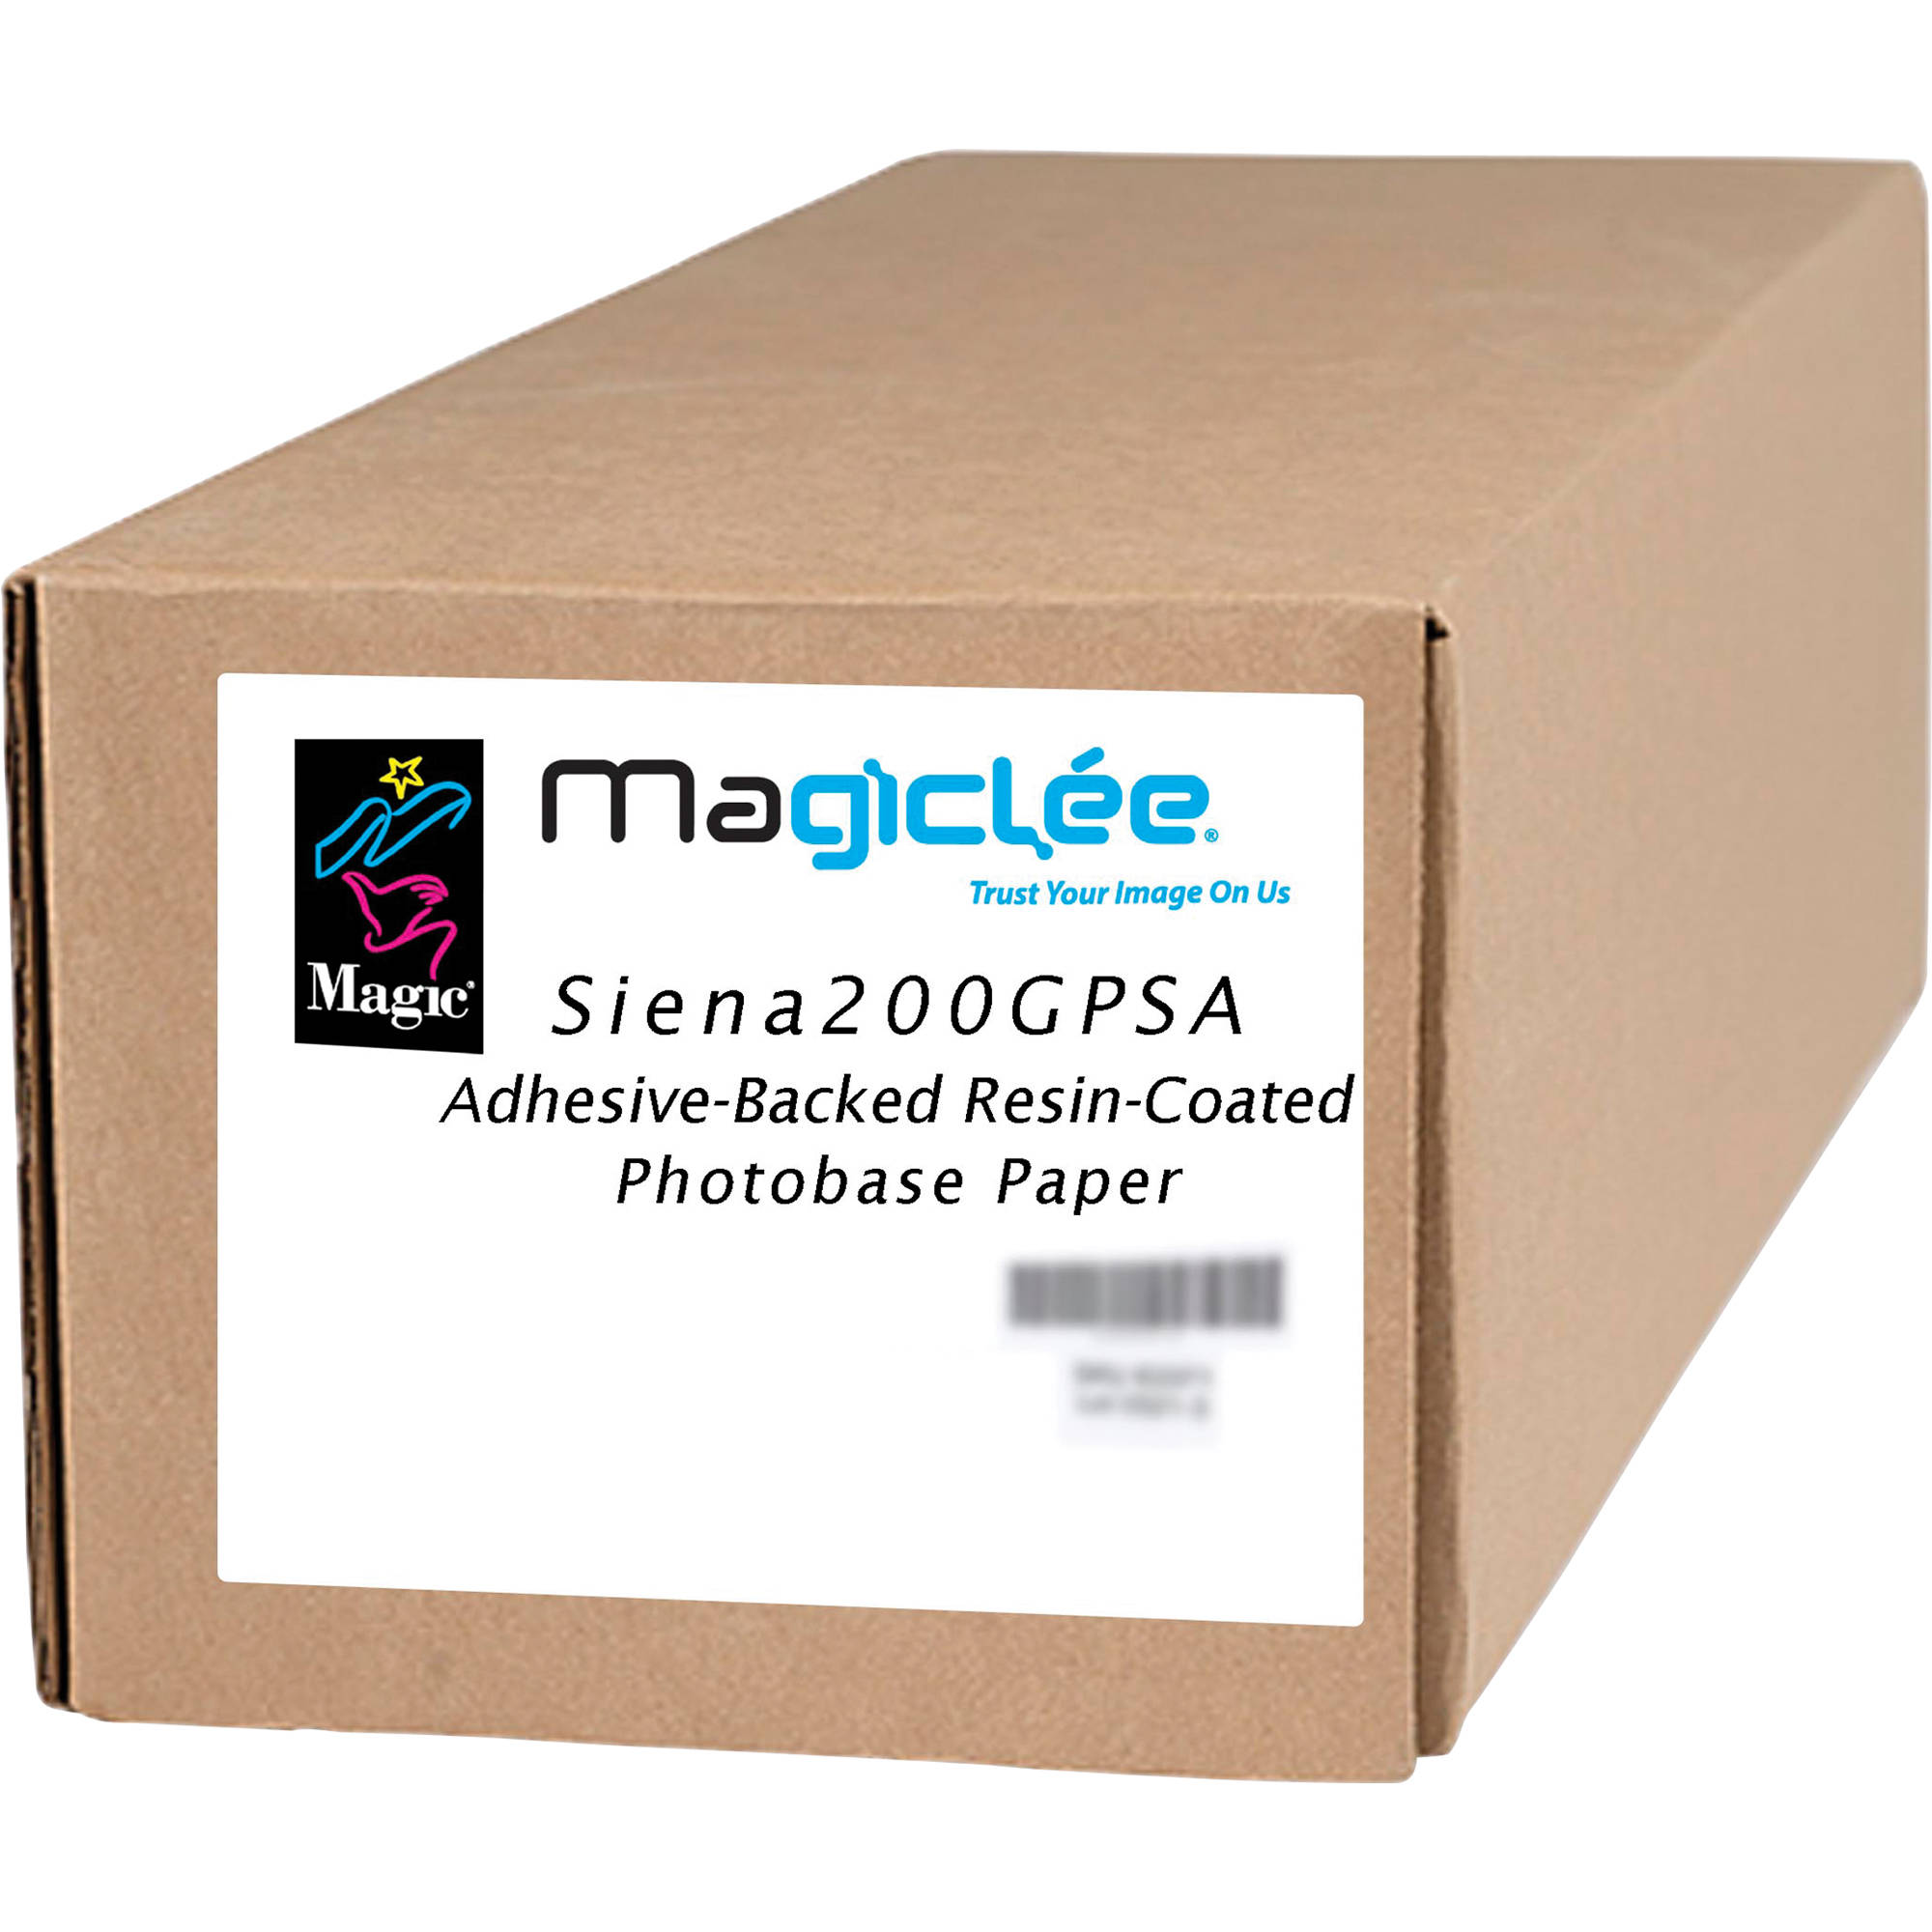 Magic Siena 200 G PSA Adhesive-Backed Resin-Coated 66176 B&H